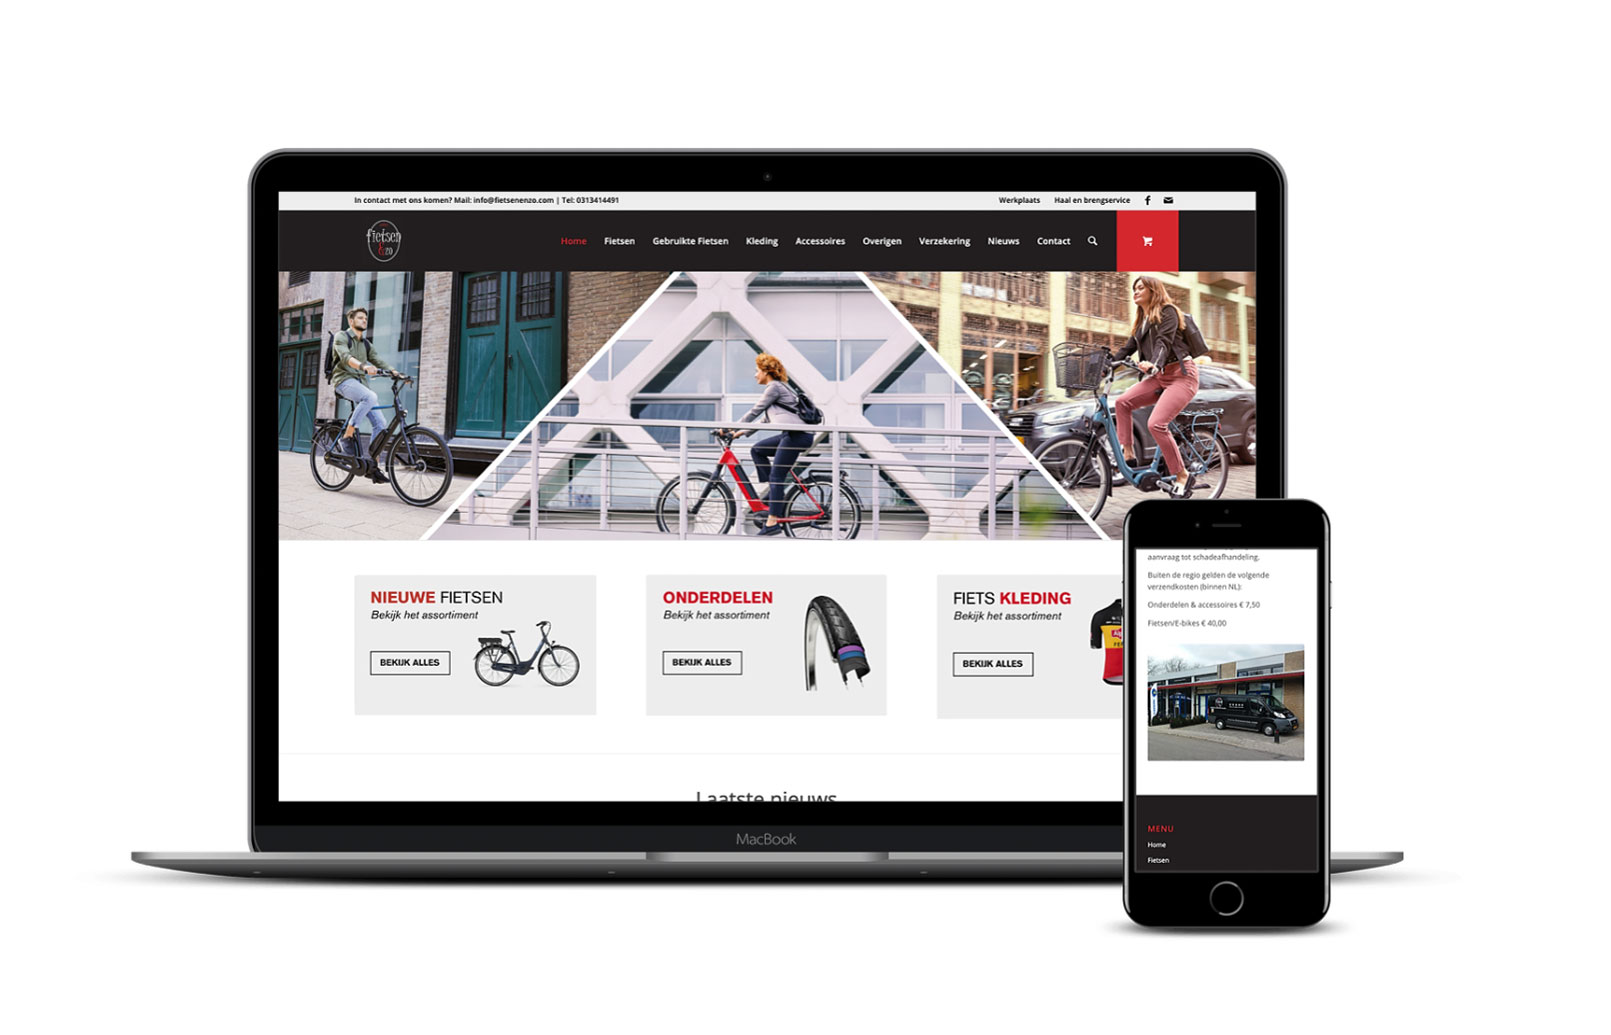 Celina Klarenbeek - fietsen & zo